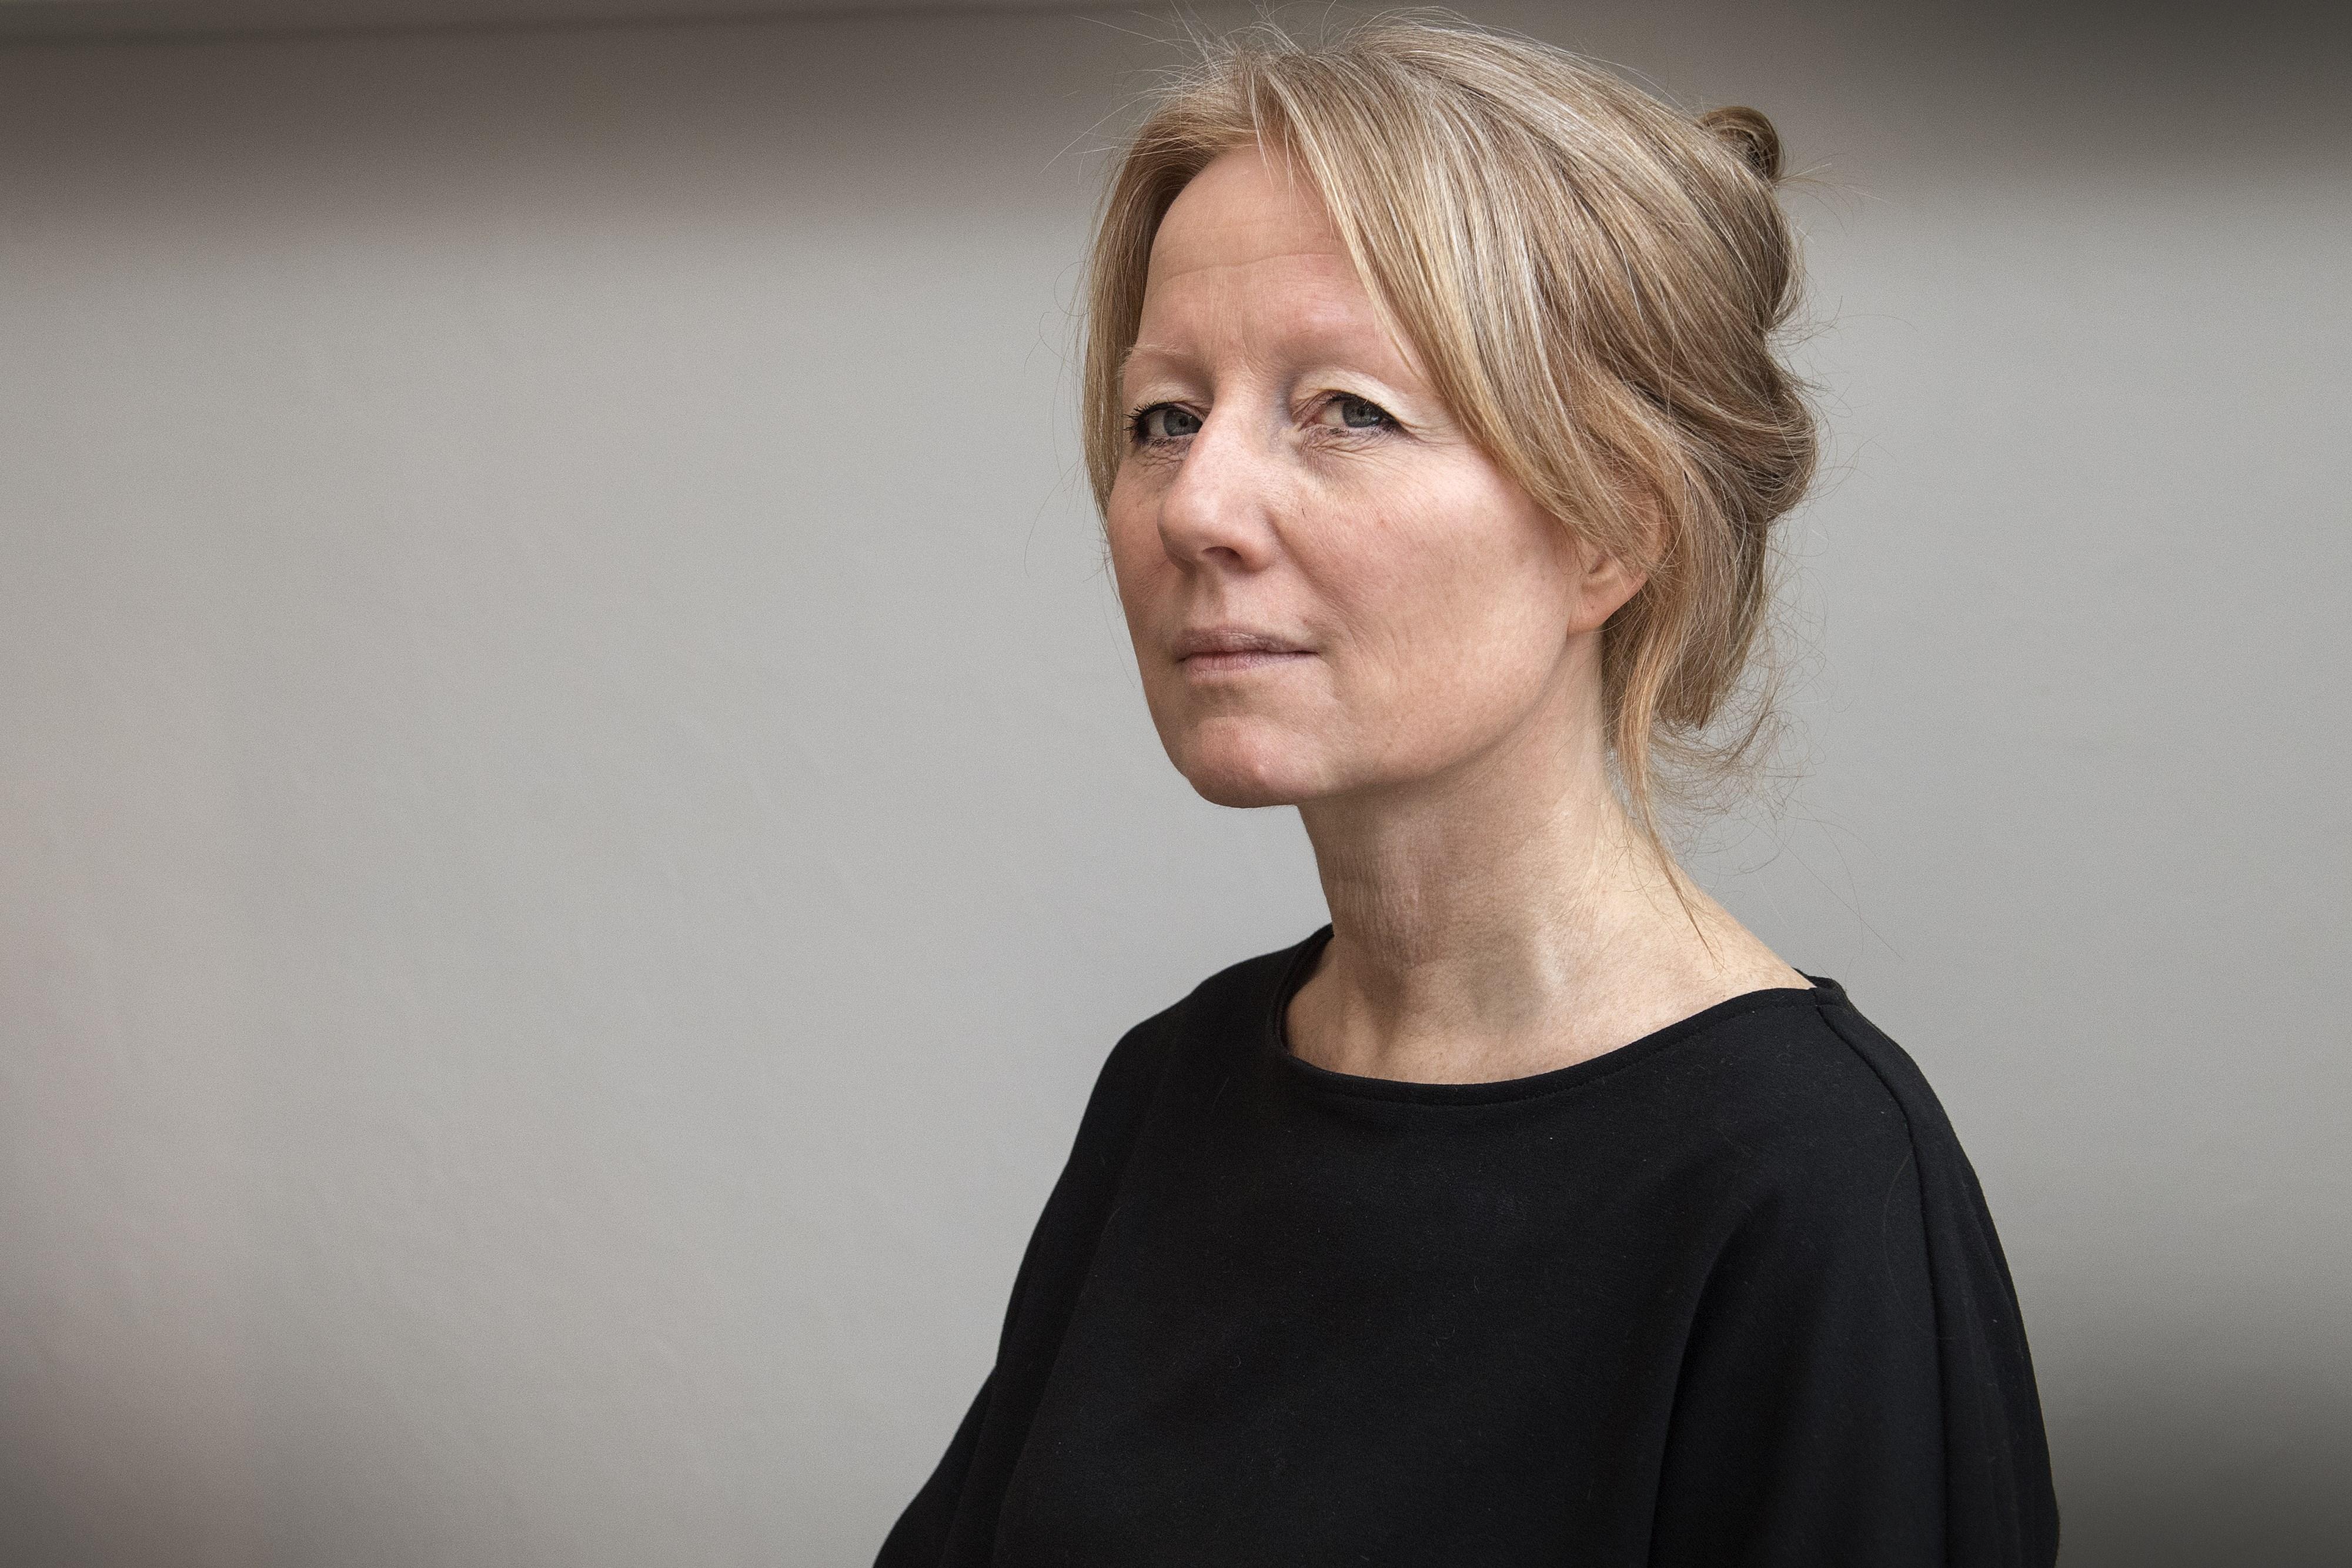 psykolog nordjylland